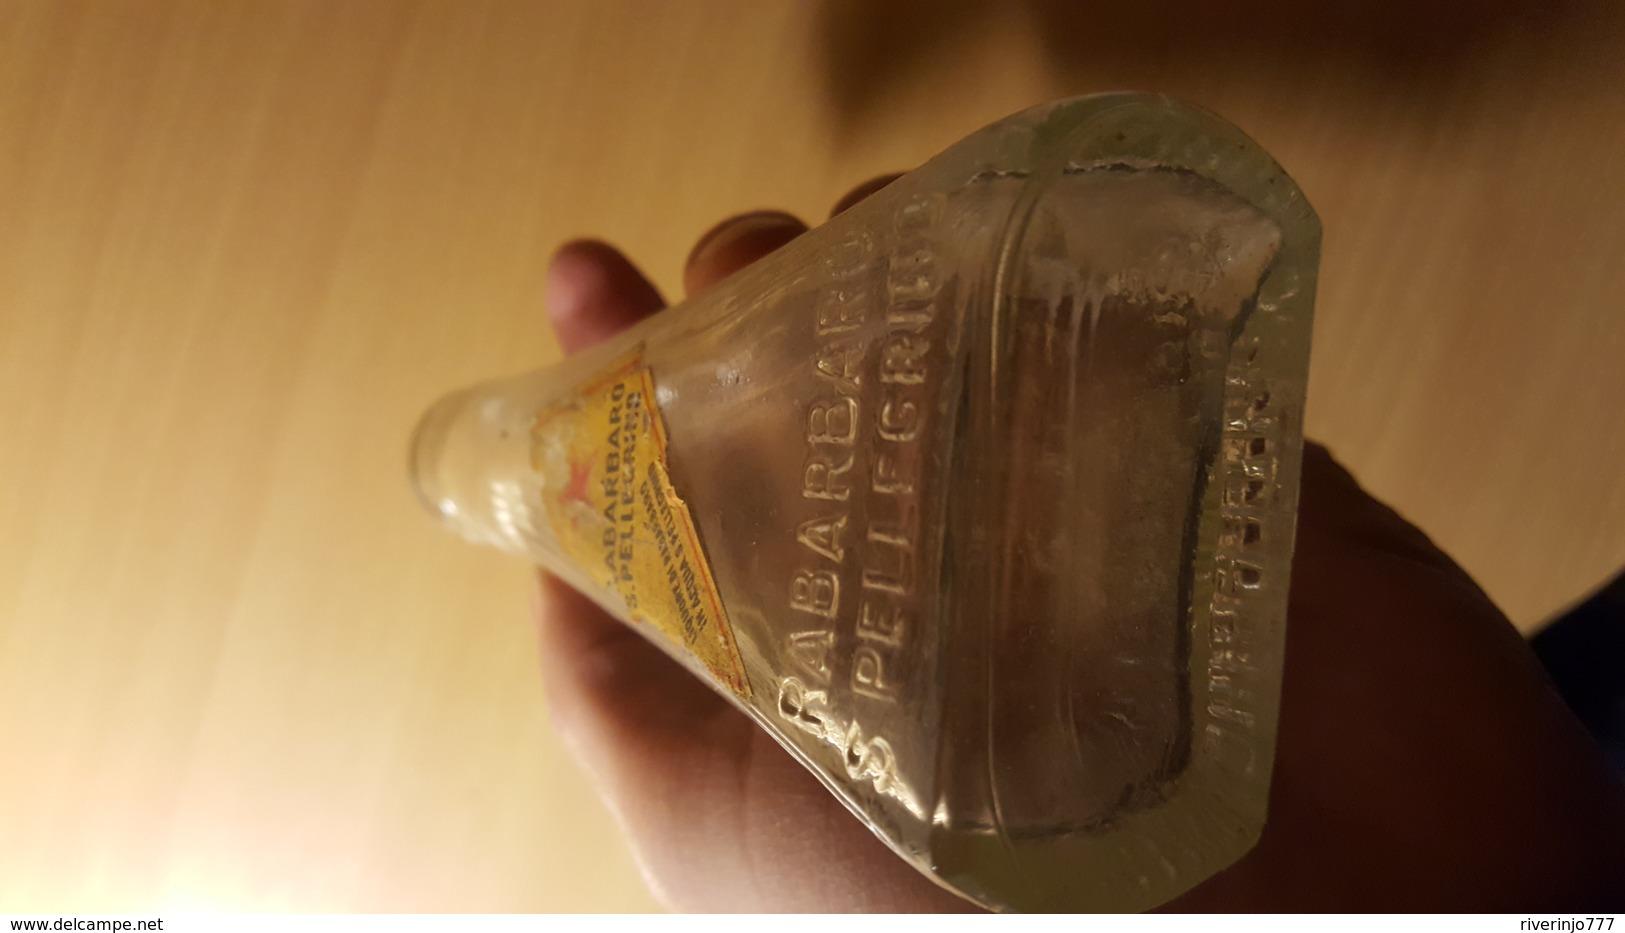 Very Old Bottle Vial Cca 90 Years San Pellegrino Rabarbaro Con Eticeta Etiquette Italia RRR - Glass & Crystal